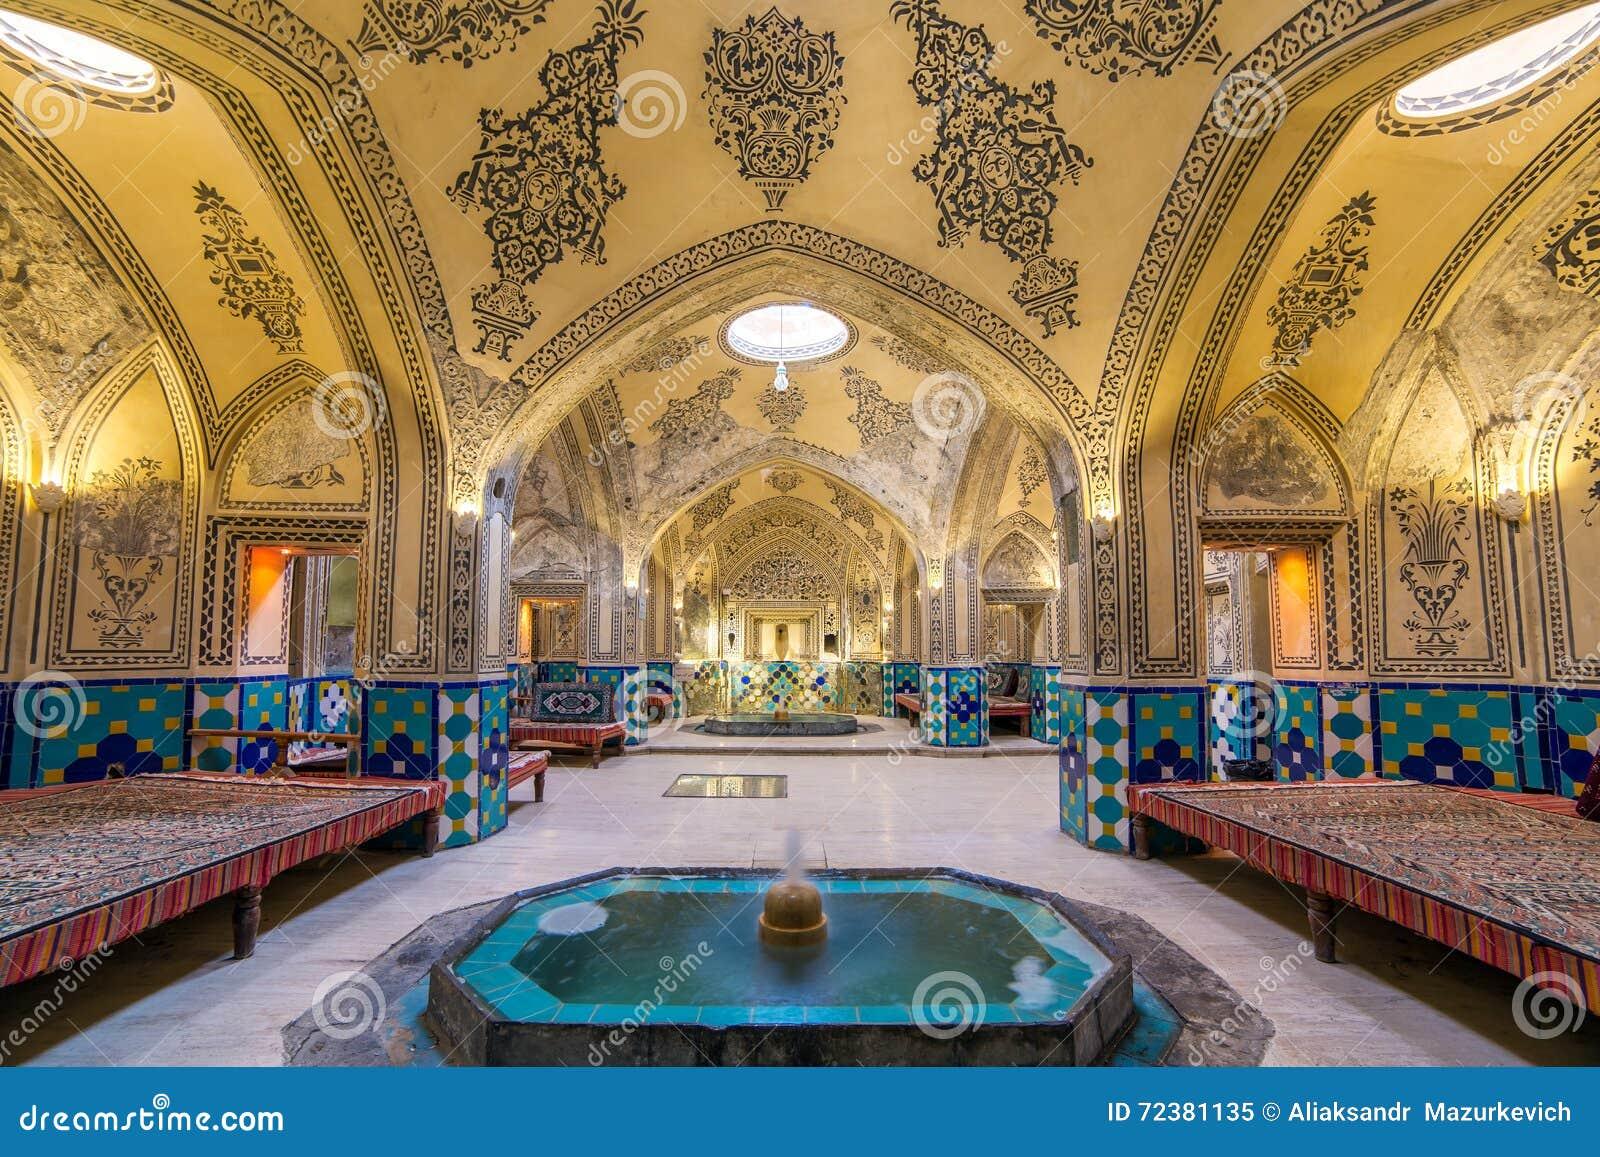 Sultan Amir Ahmad historic bath, Iran